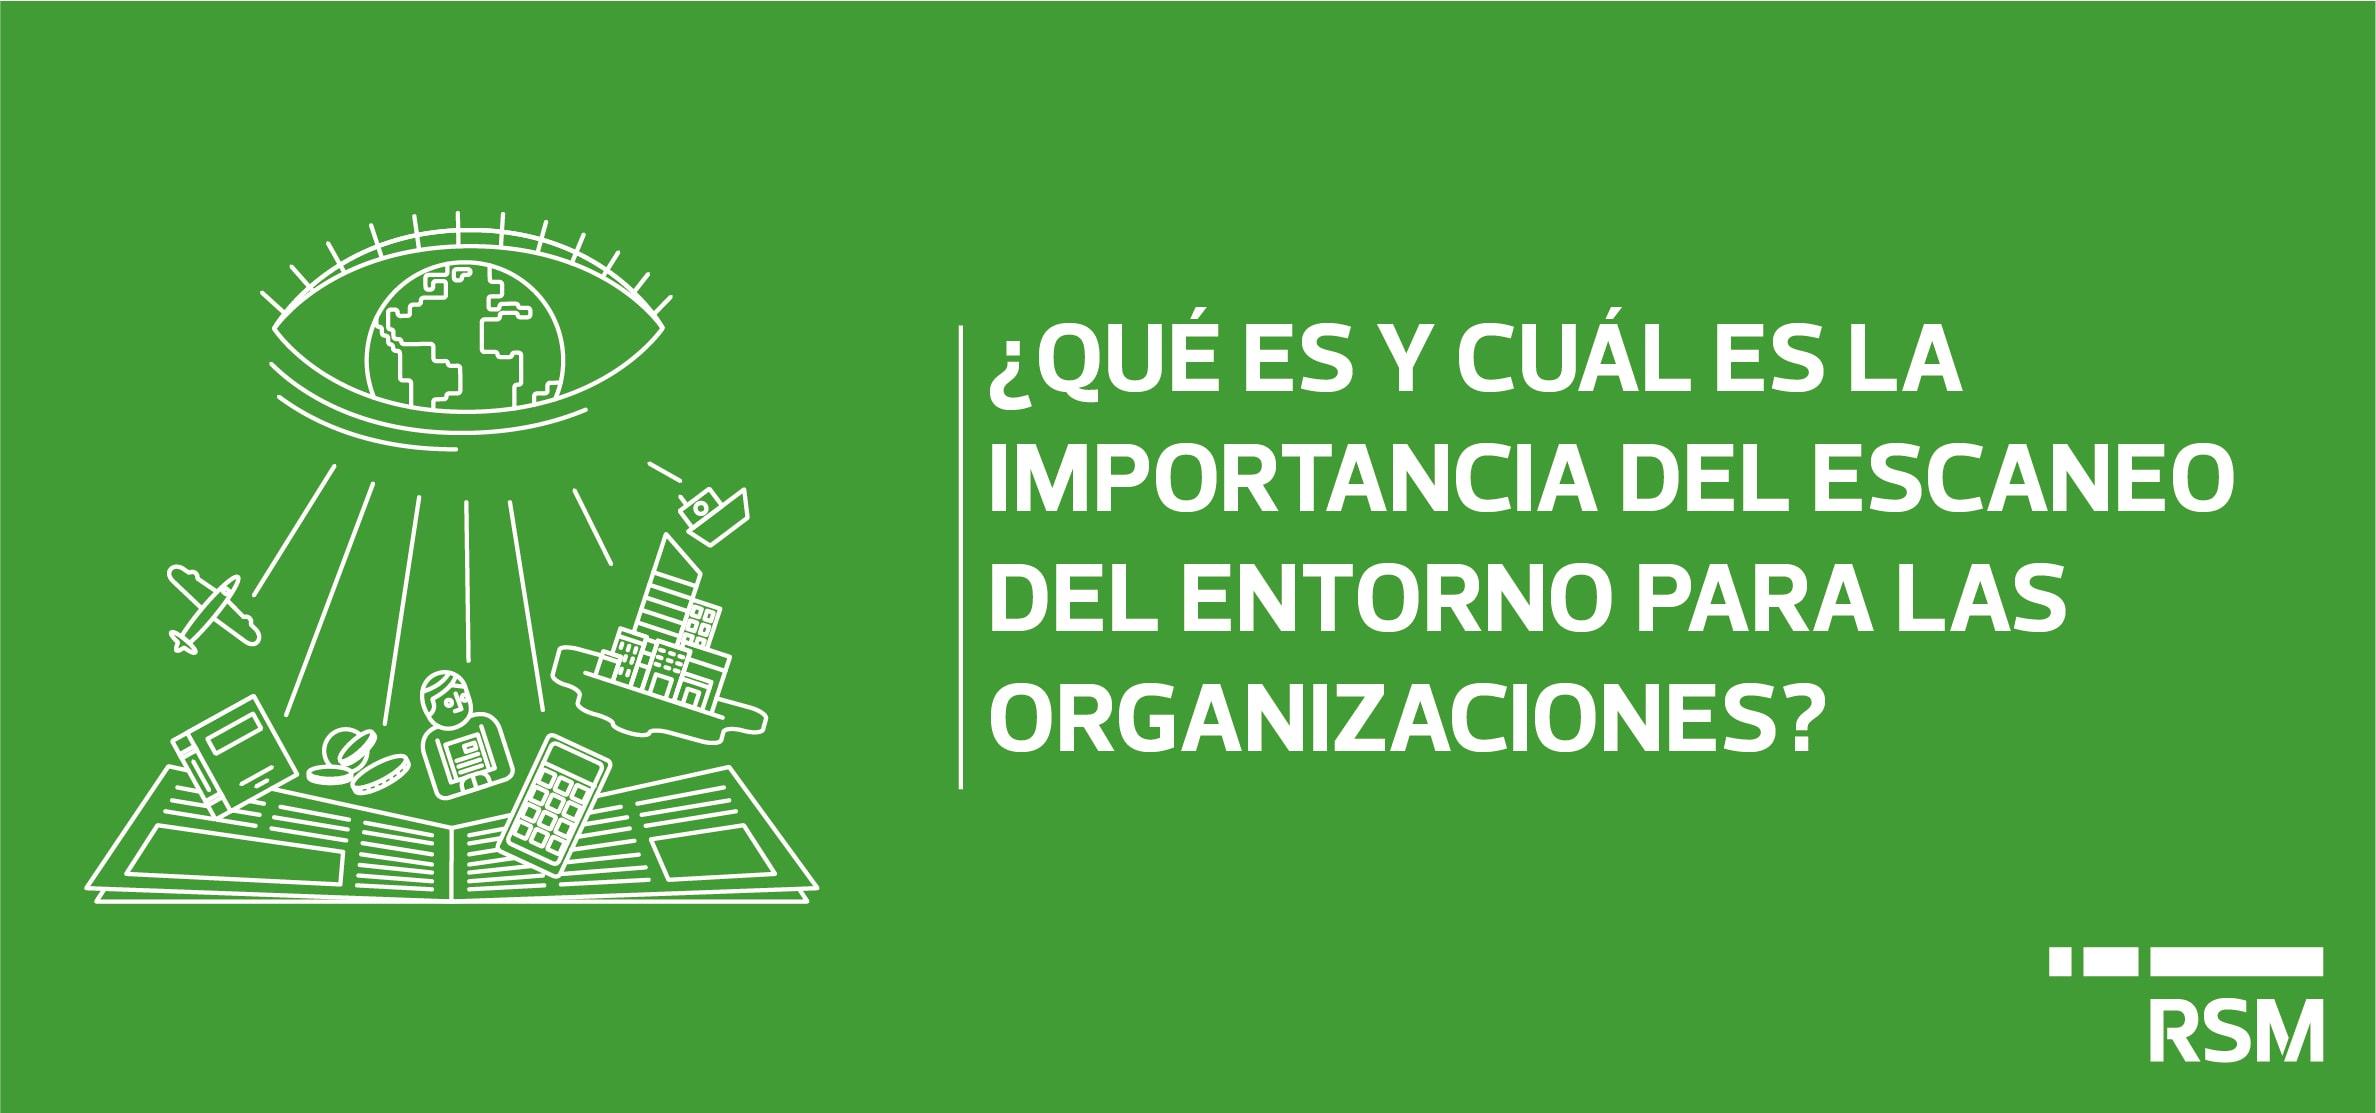 public://media/Lineas_negocio/consultoria/Insights/IMG/miniaturas_pagina_web_blogs-08.jpg